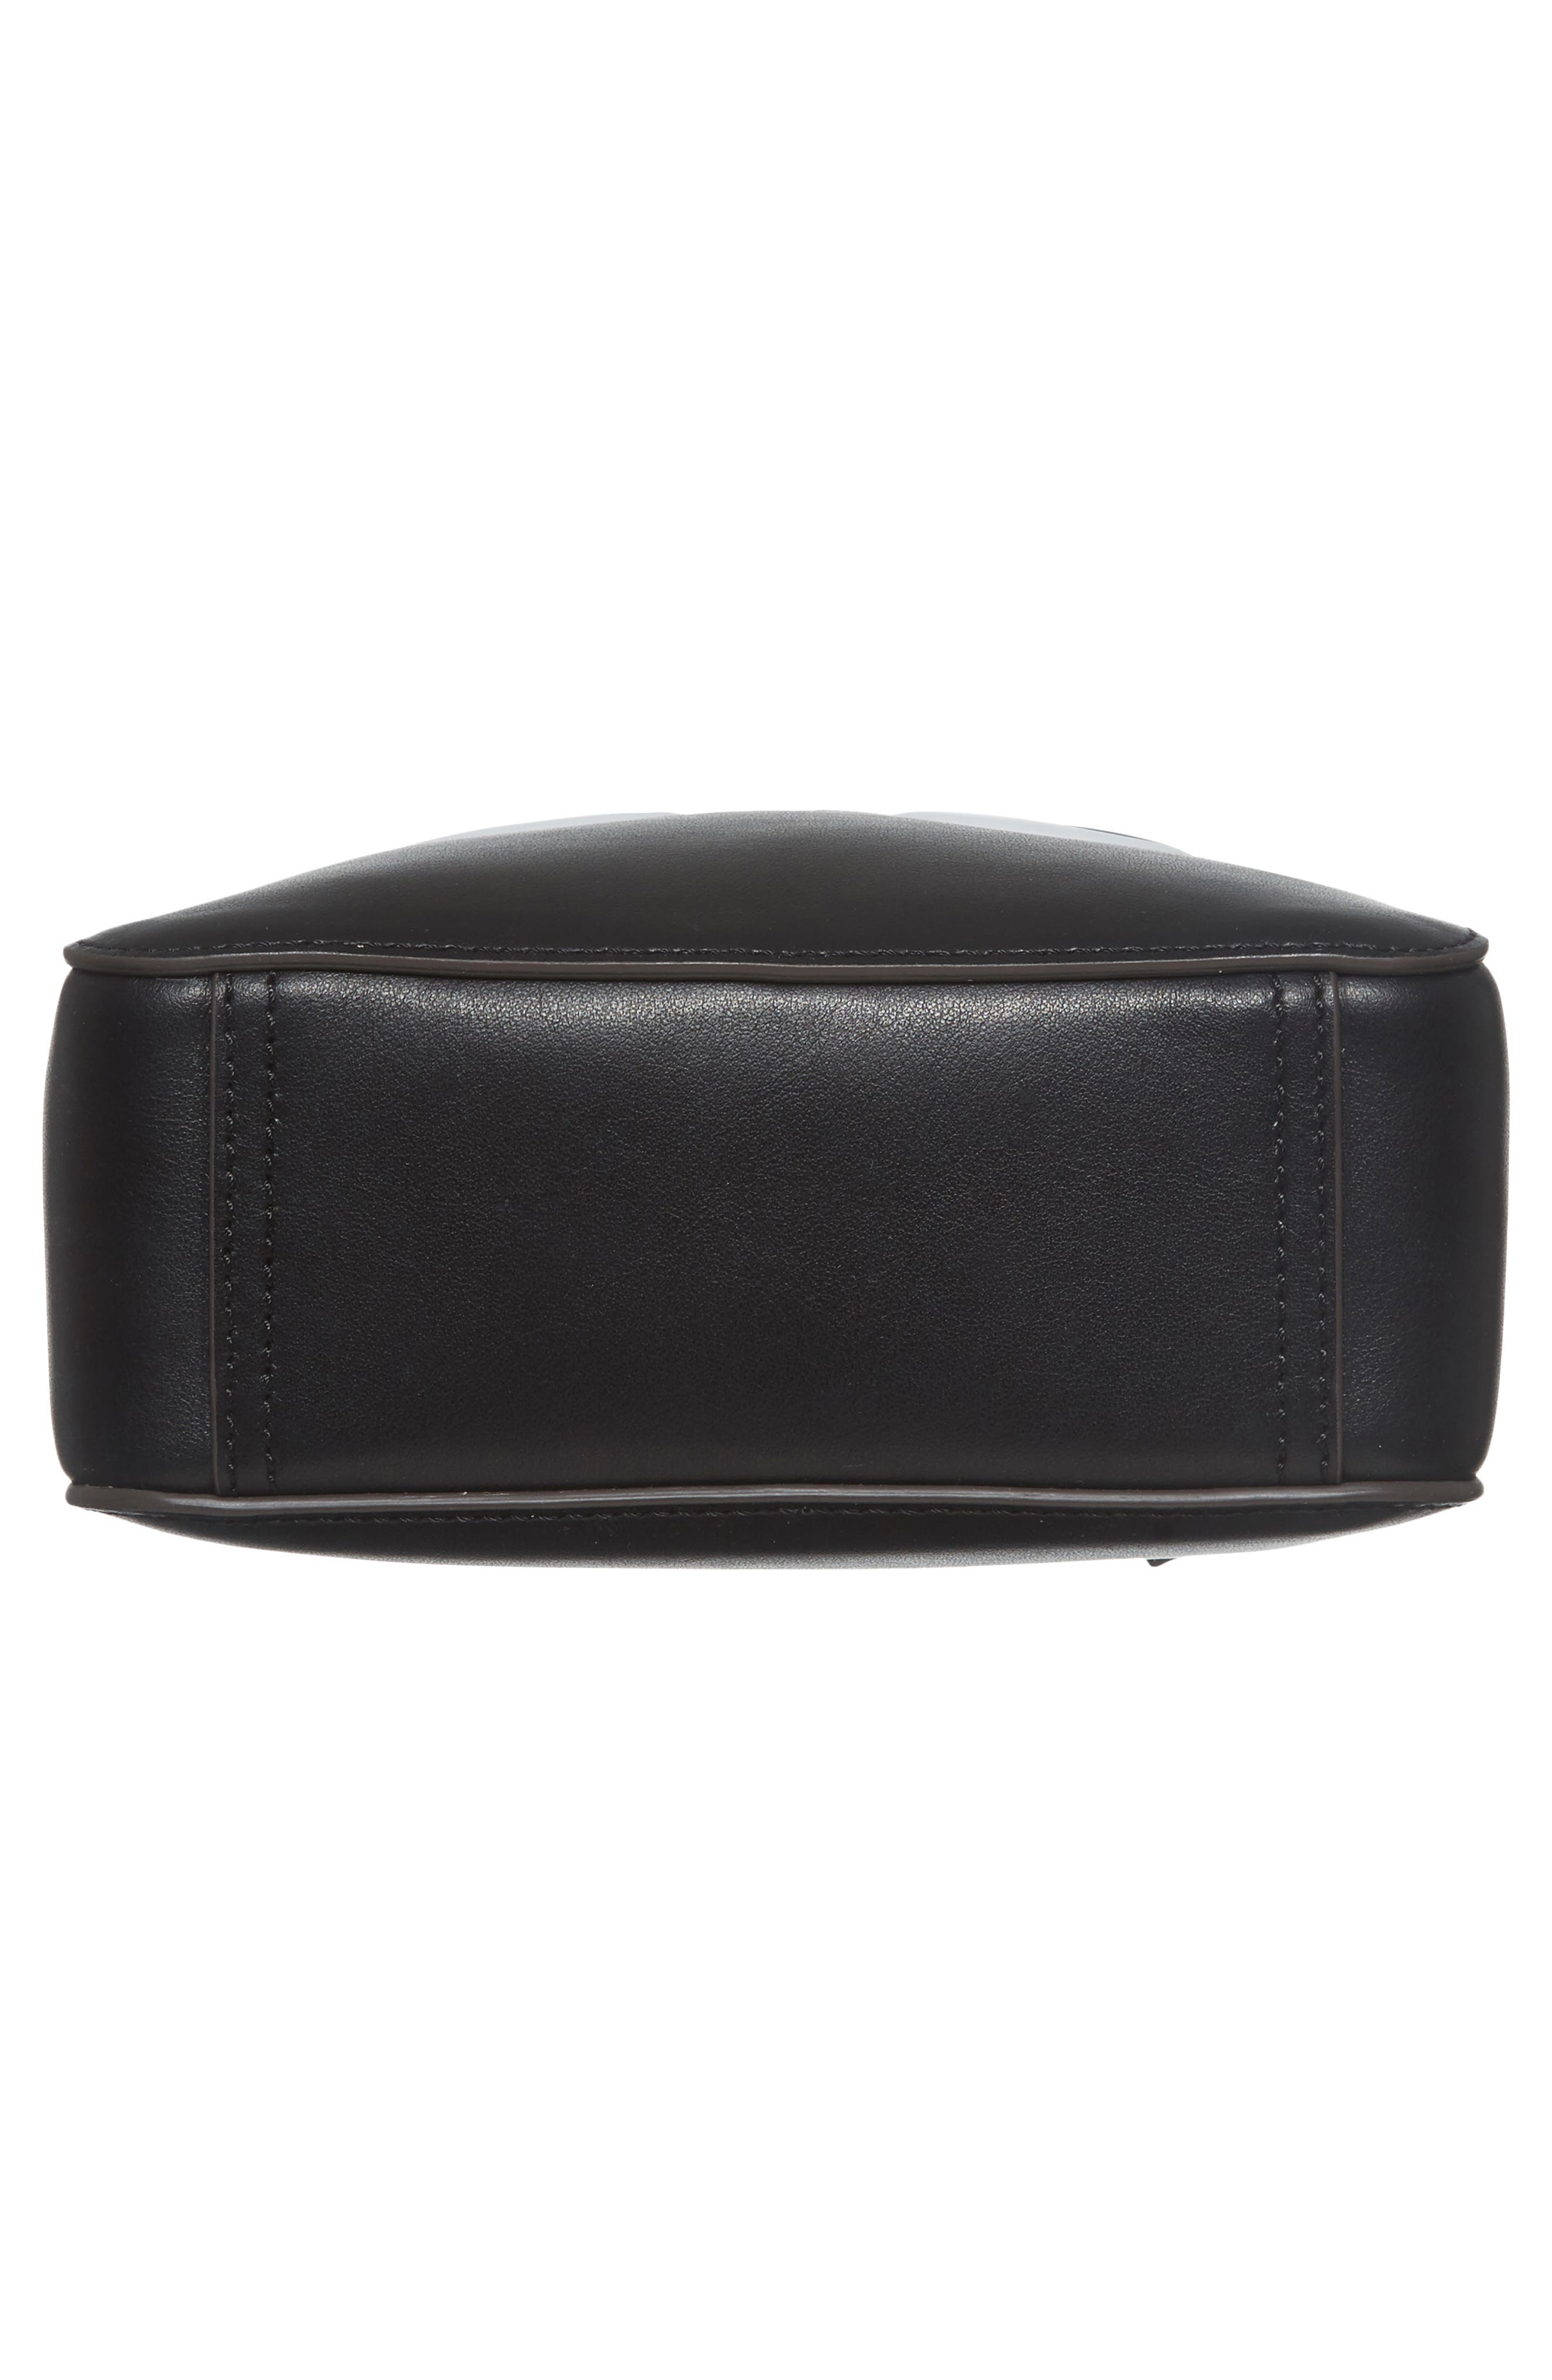 Eyes Camera Leather Crossbody Bag,                             Alternate thumbnail 6, color,                             BLACK